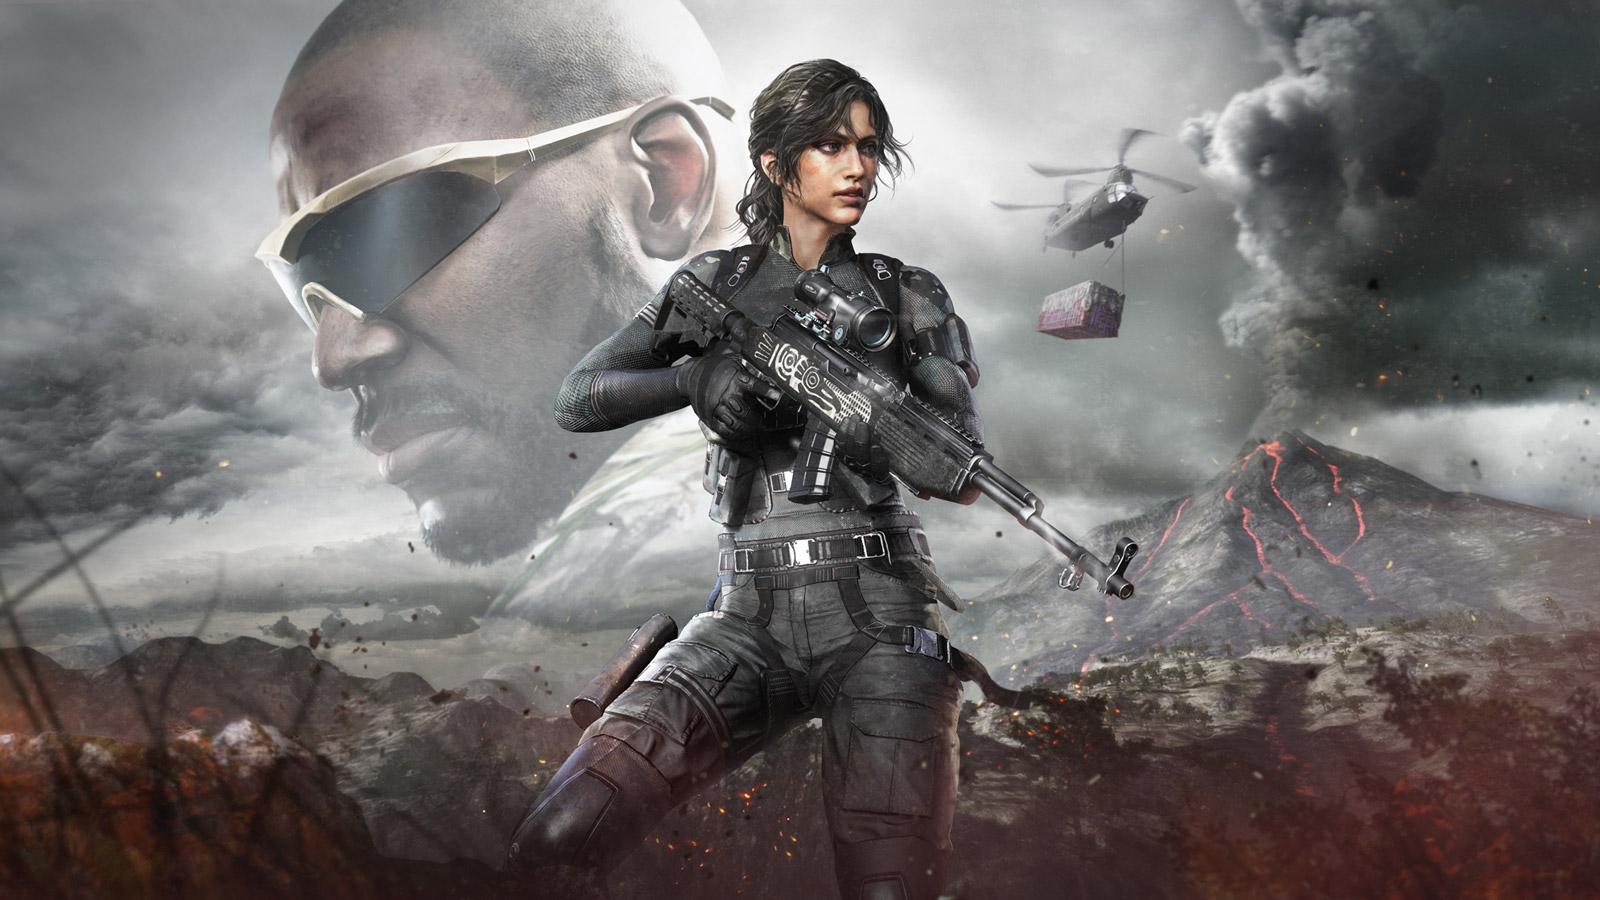 Free PlayerUnknown's Battlegrounds Wallpaper in 1600x900